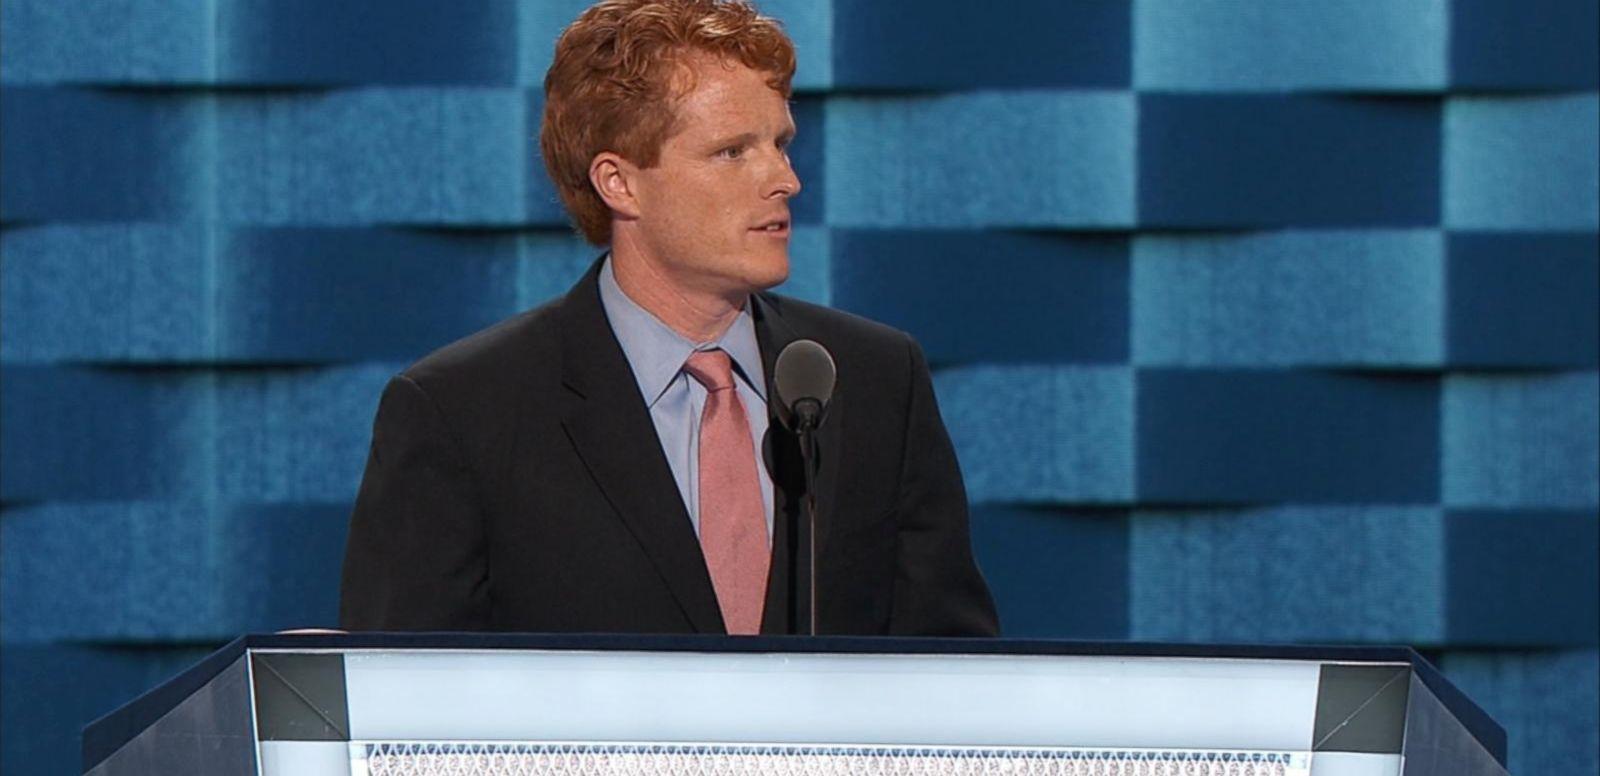 VIDEO: Kennedy Shares Law School Story With Professor Warren